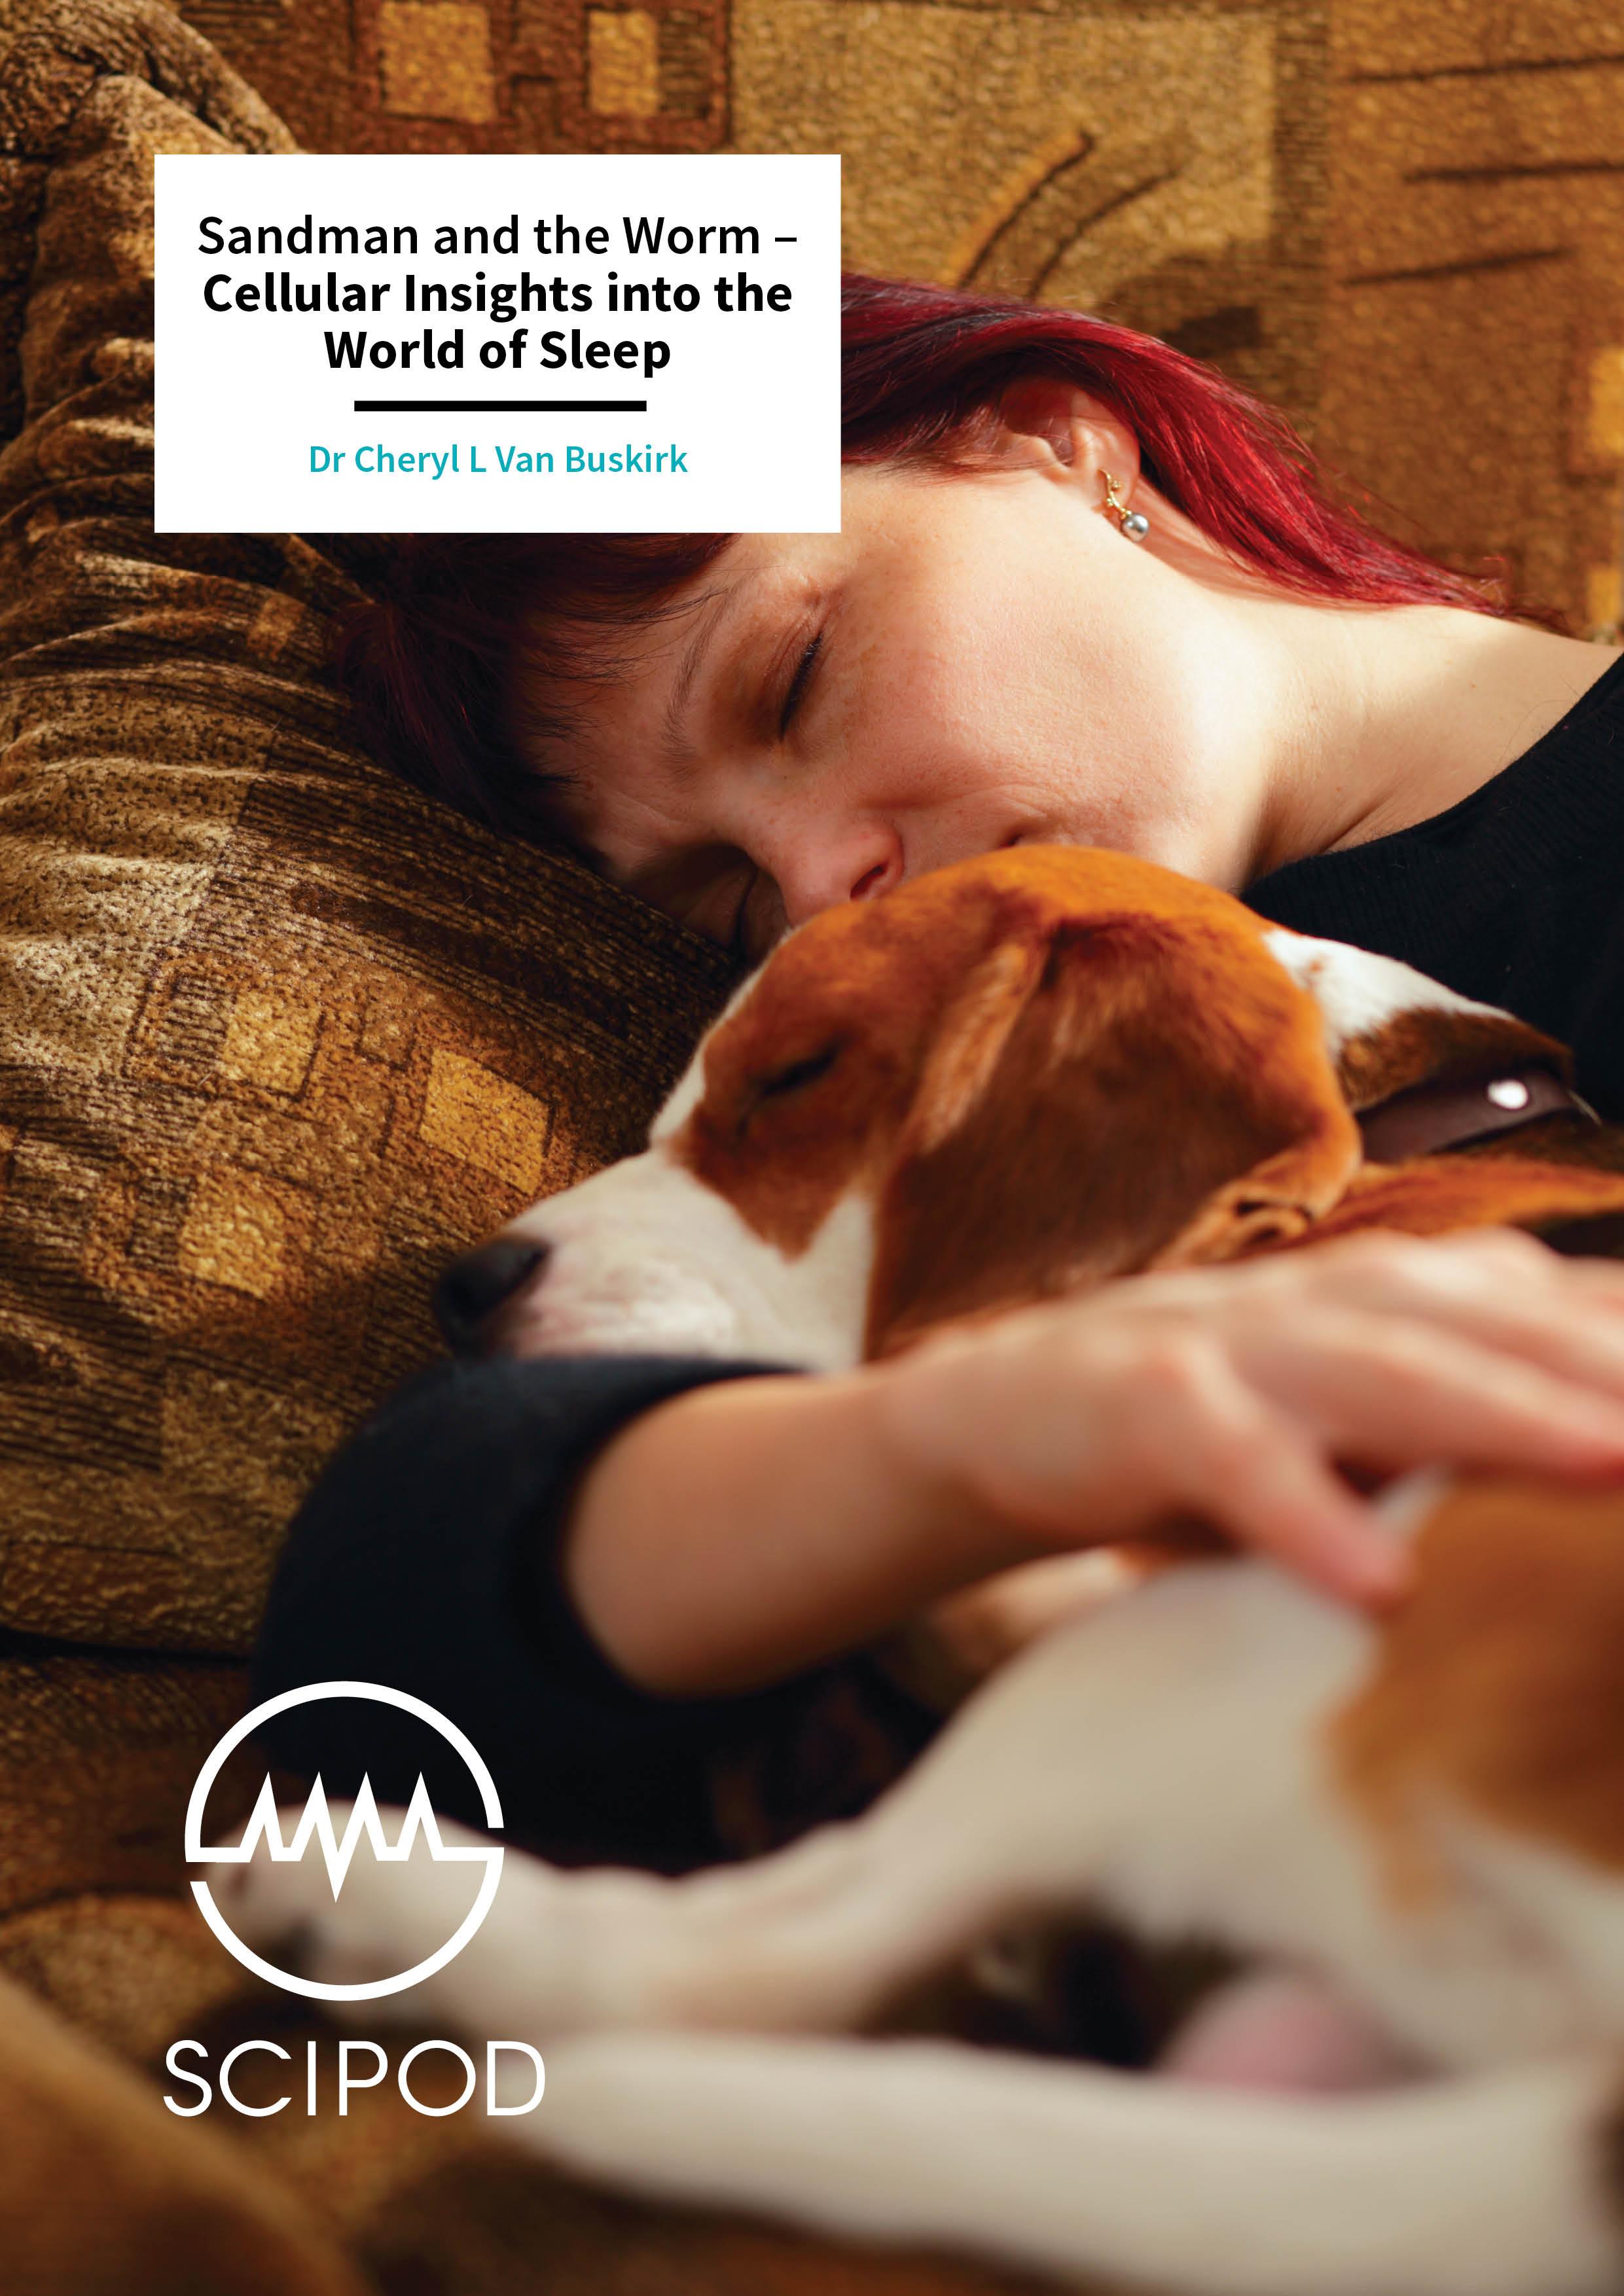 Sandman and the Worm, Cellular Insights into the World of Sleep – Dr Cheryl L Van Buskirk, California State University Northridge